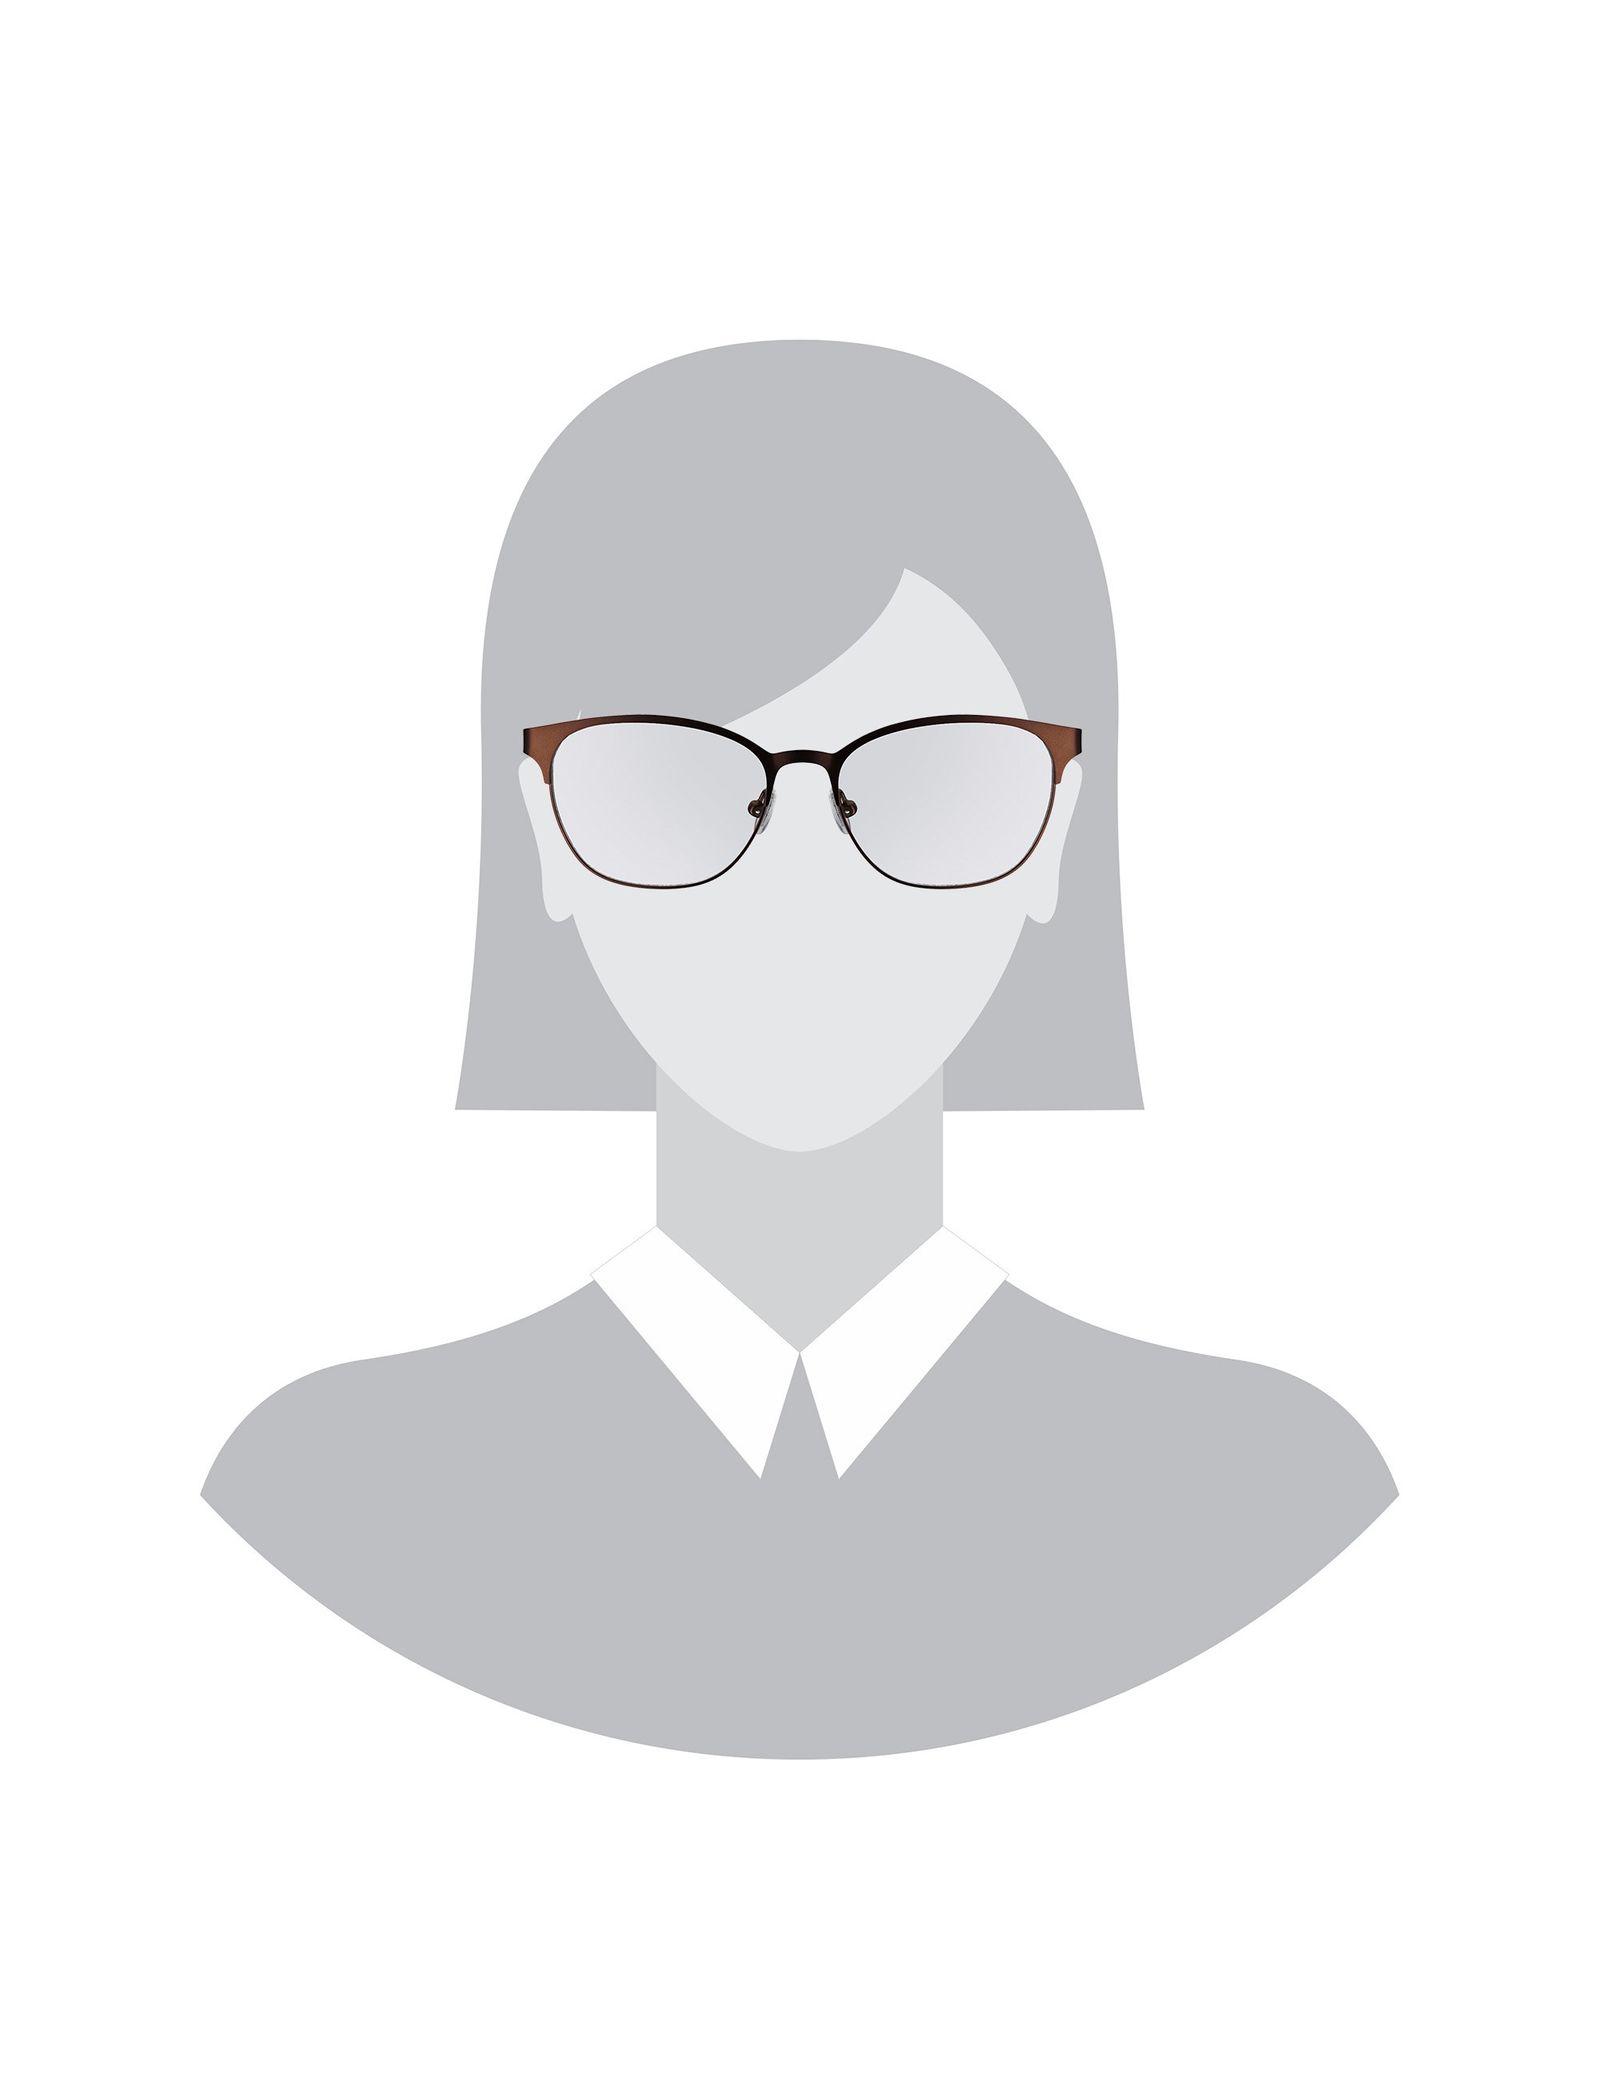 عینک طبی ویفرر زنانه - پپه جینز - قهوه اي - 5